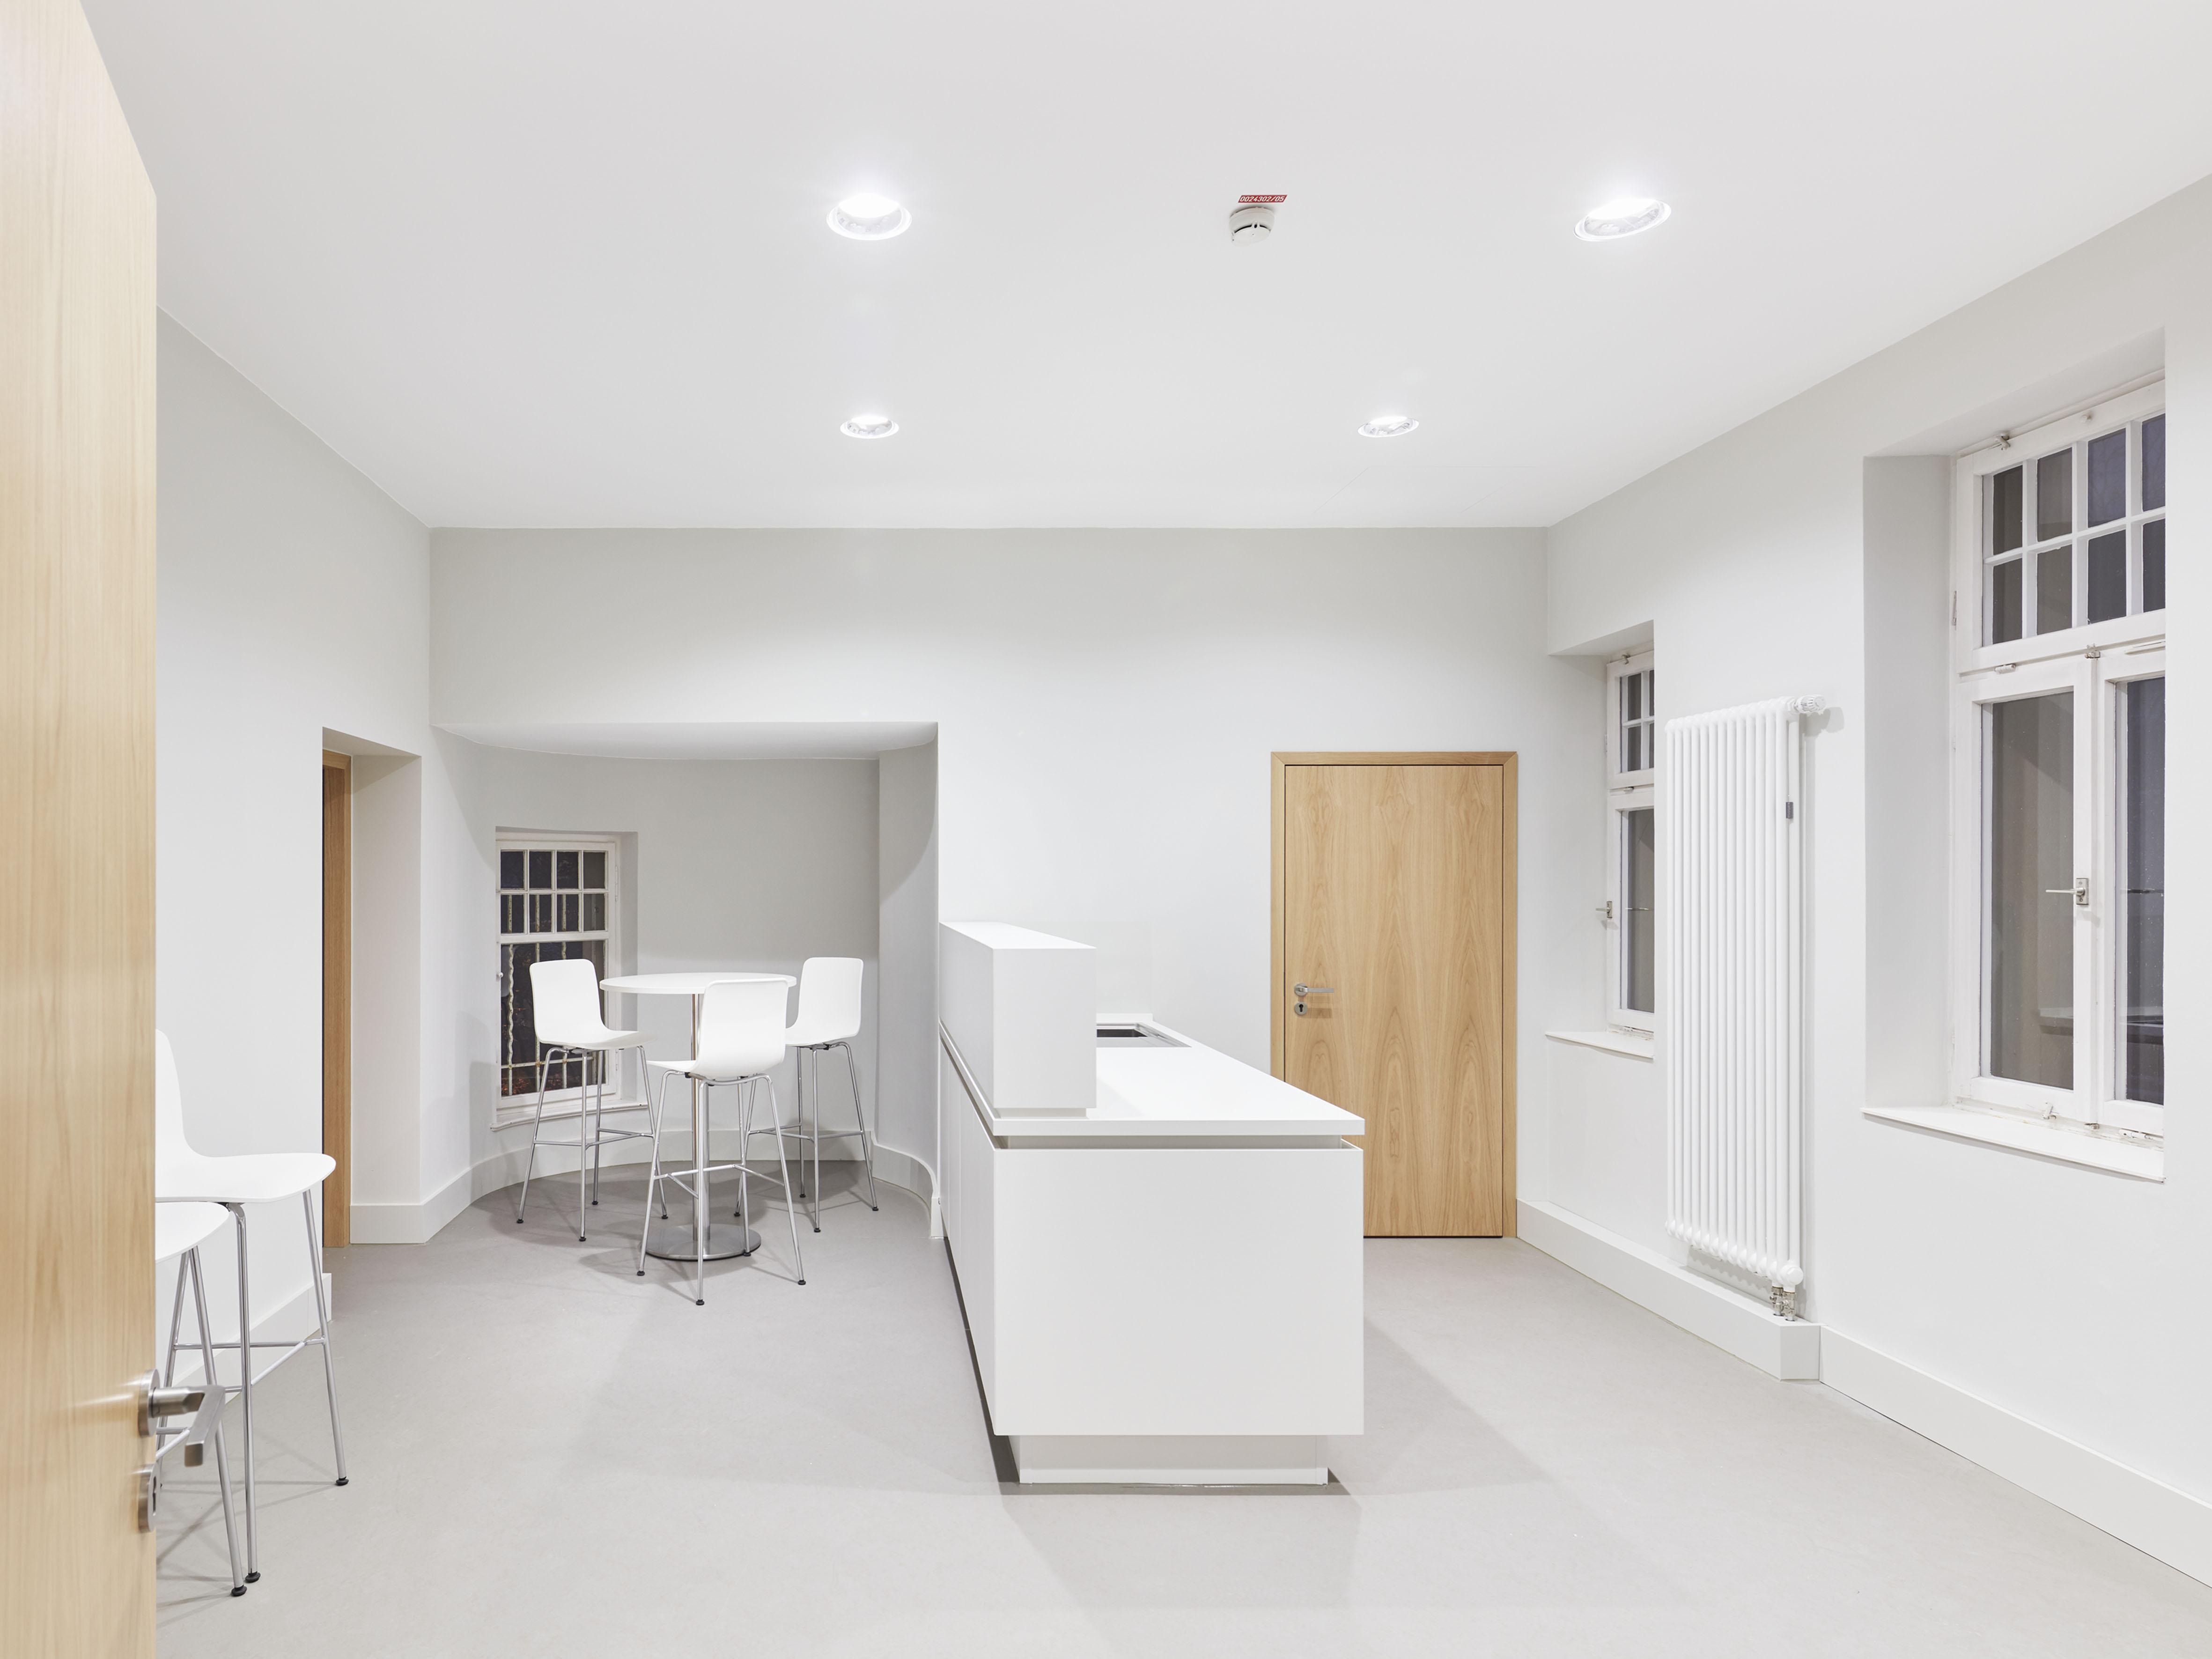 Umbau denkmalgeschützter Direktorenvilla zur neuen ›School of Education‹ (8)